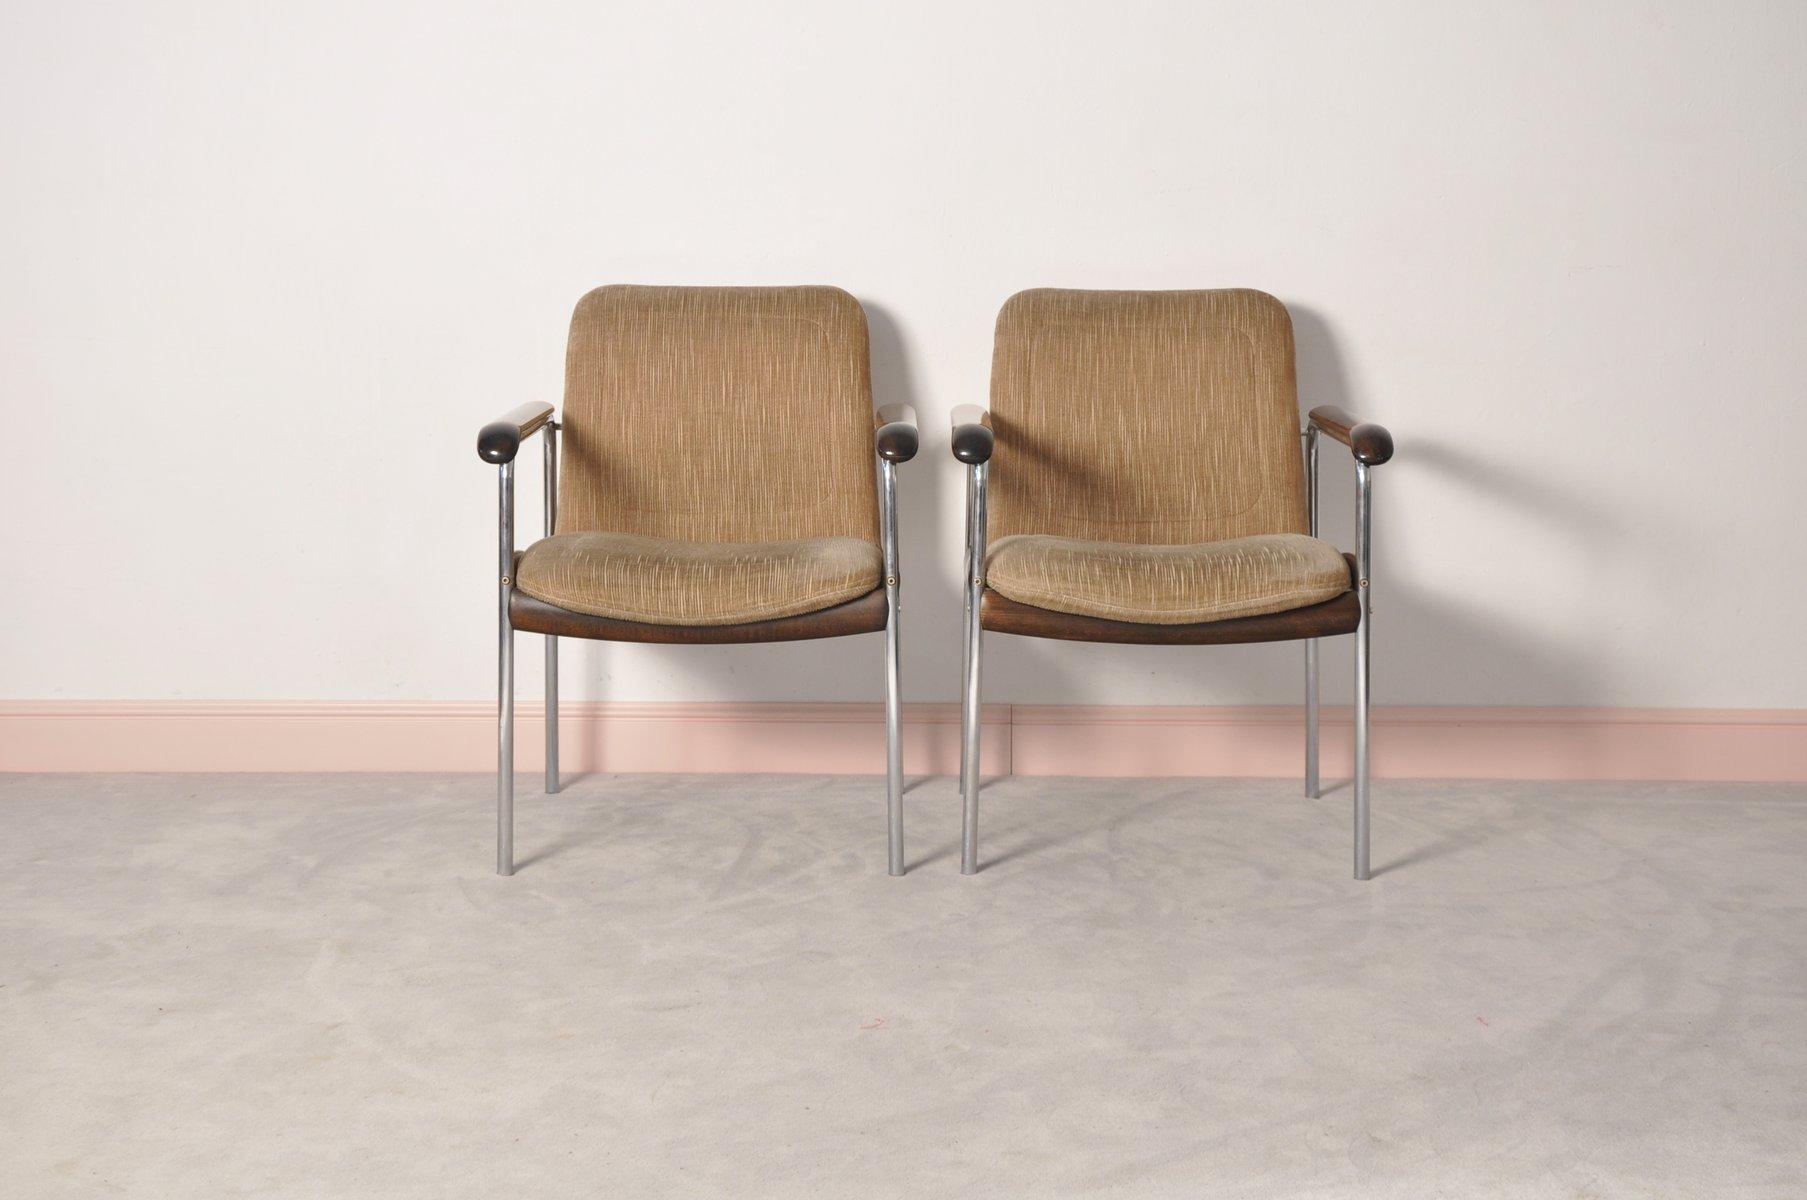 italienische vintage st hle 2er set bei pamono kaufen. Black Bedroom Furniture Sets. Home Design Ideas